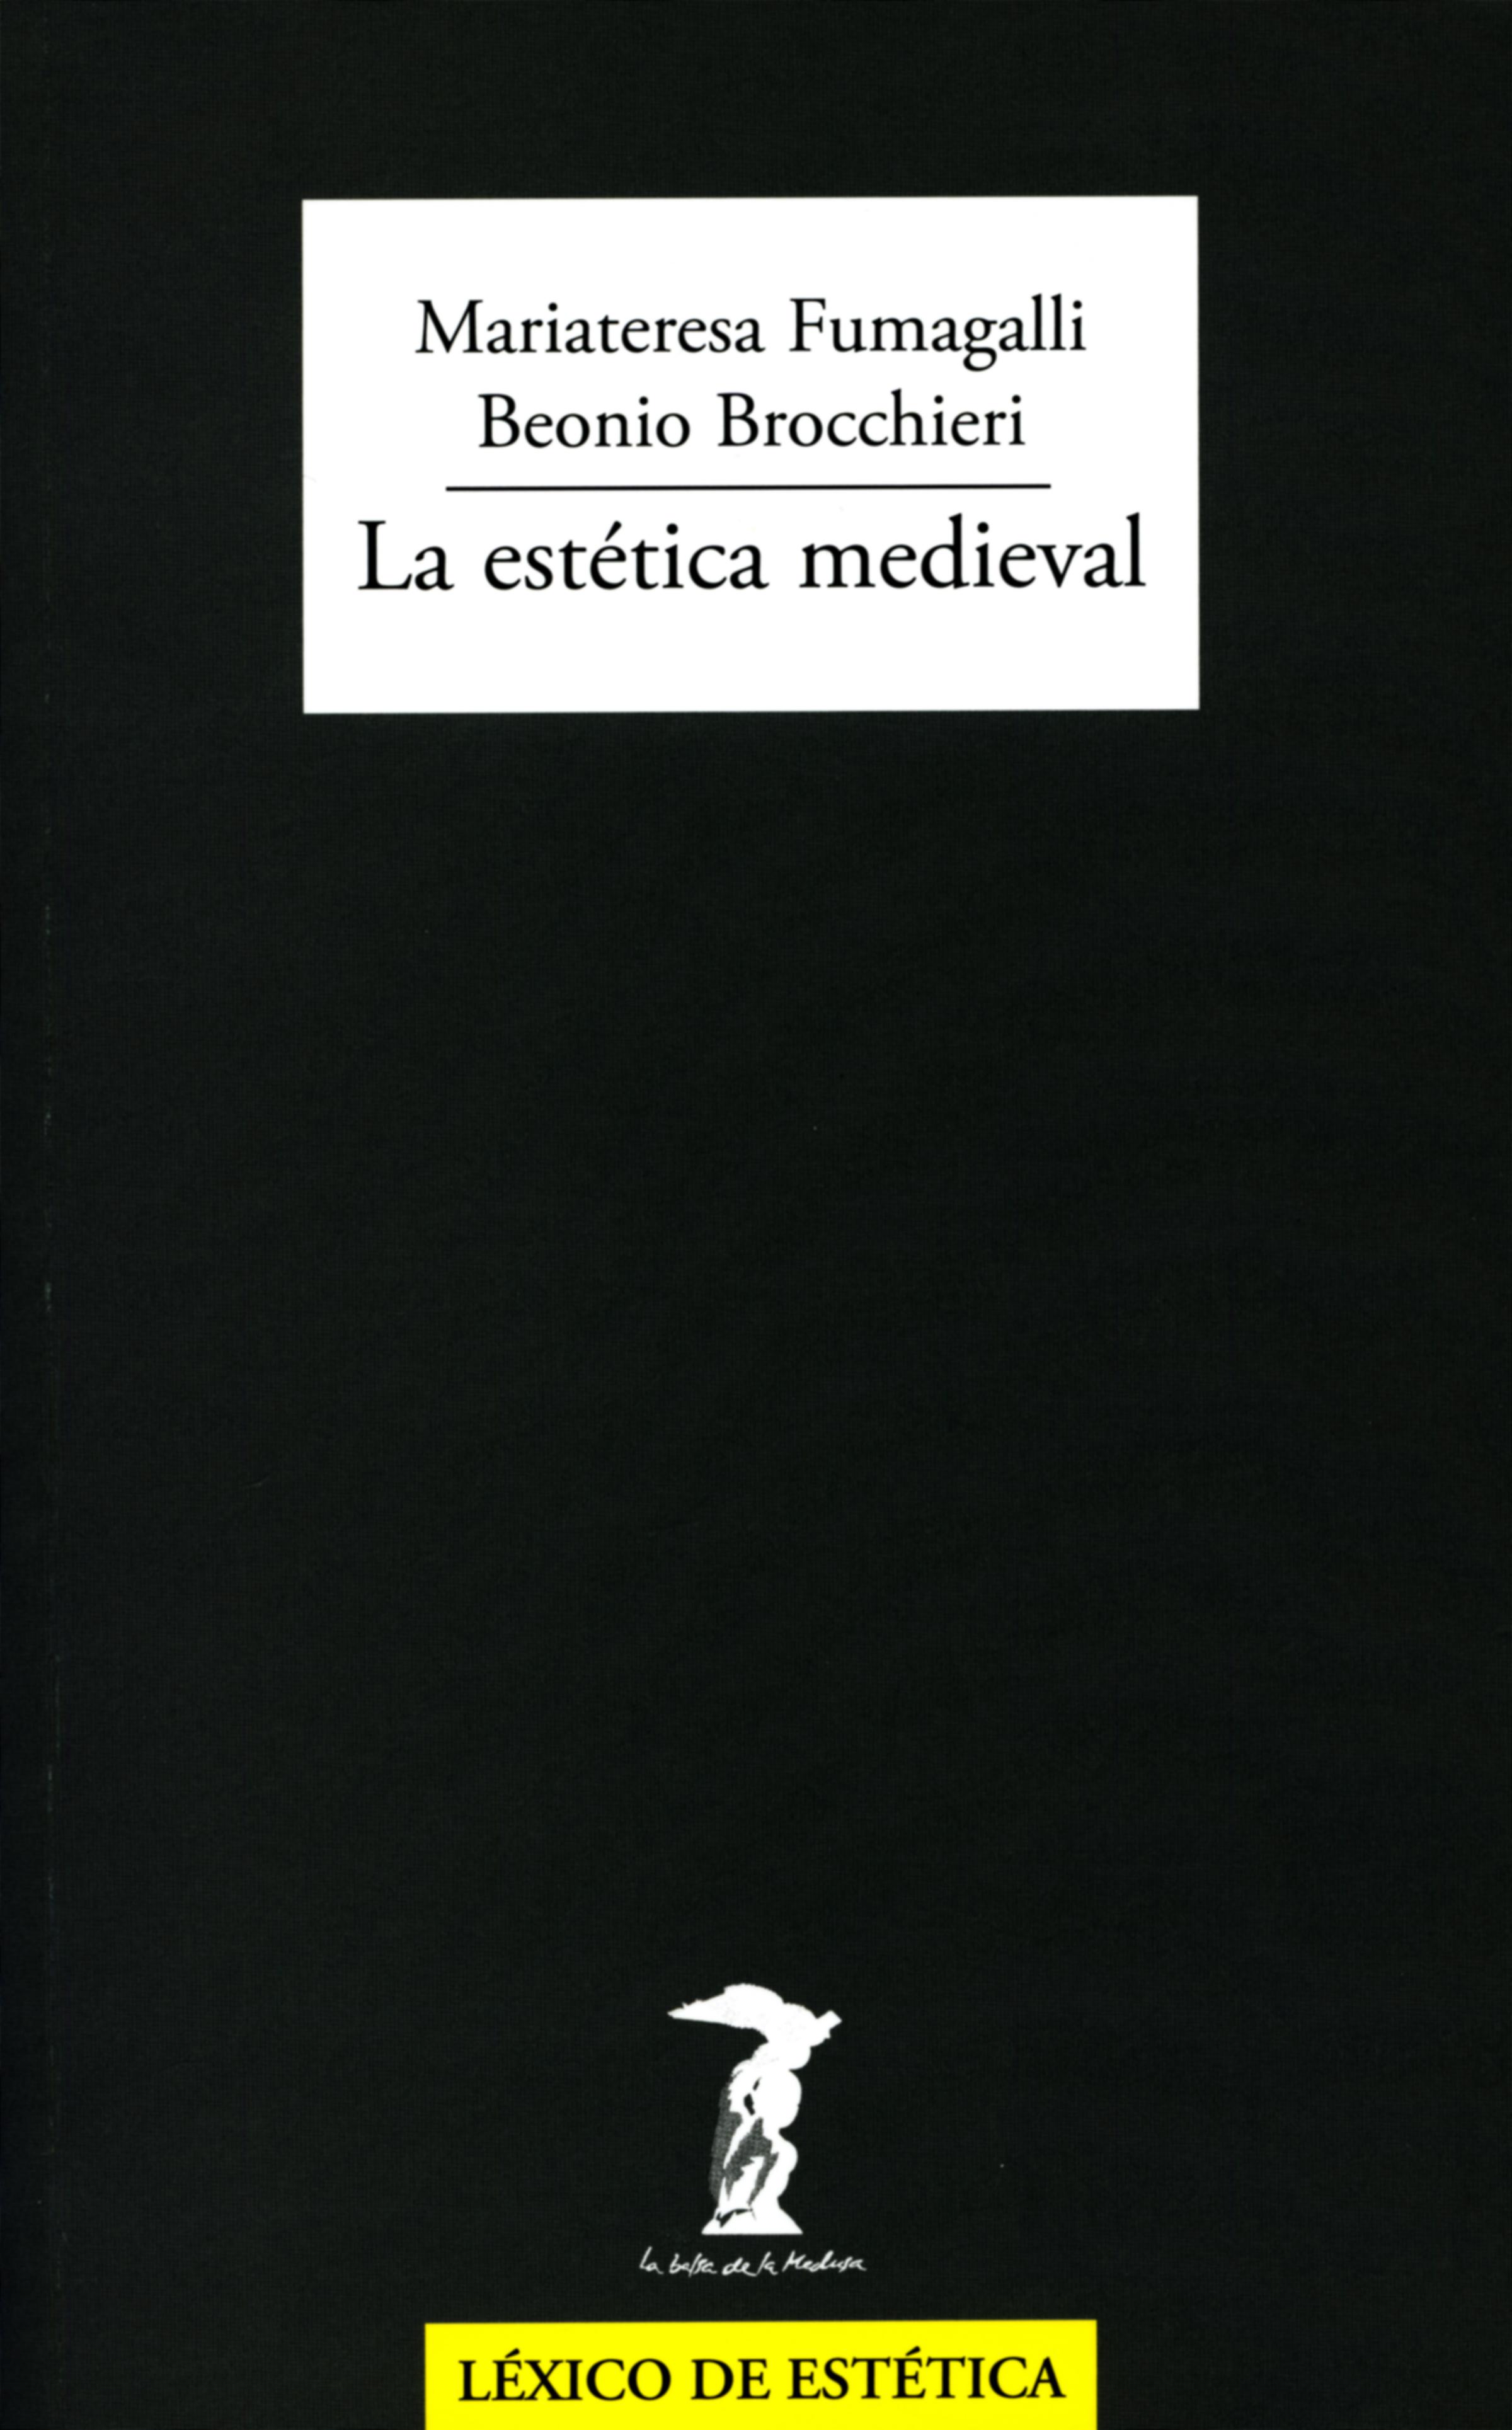 Mariateresa Fumagalli Beonio Brocchieri La estética medieval цена 2017